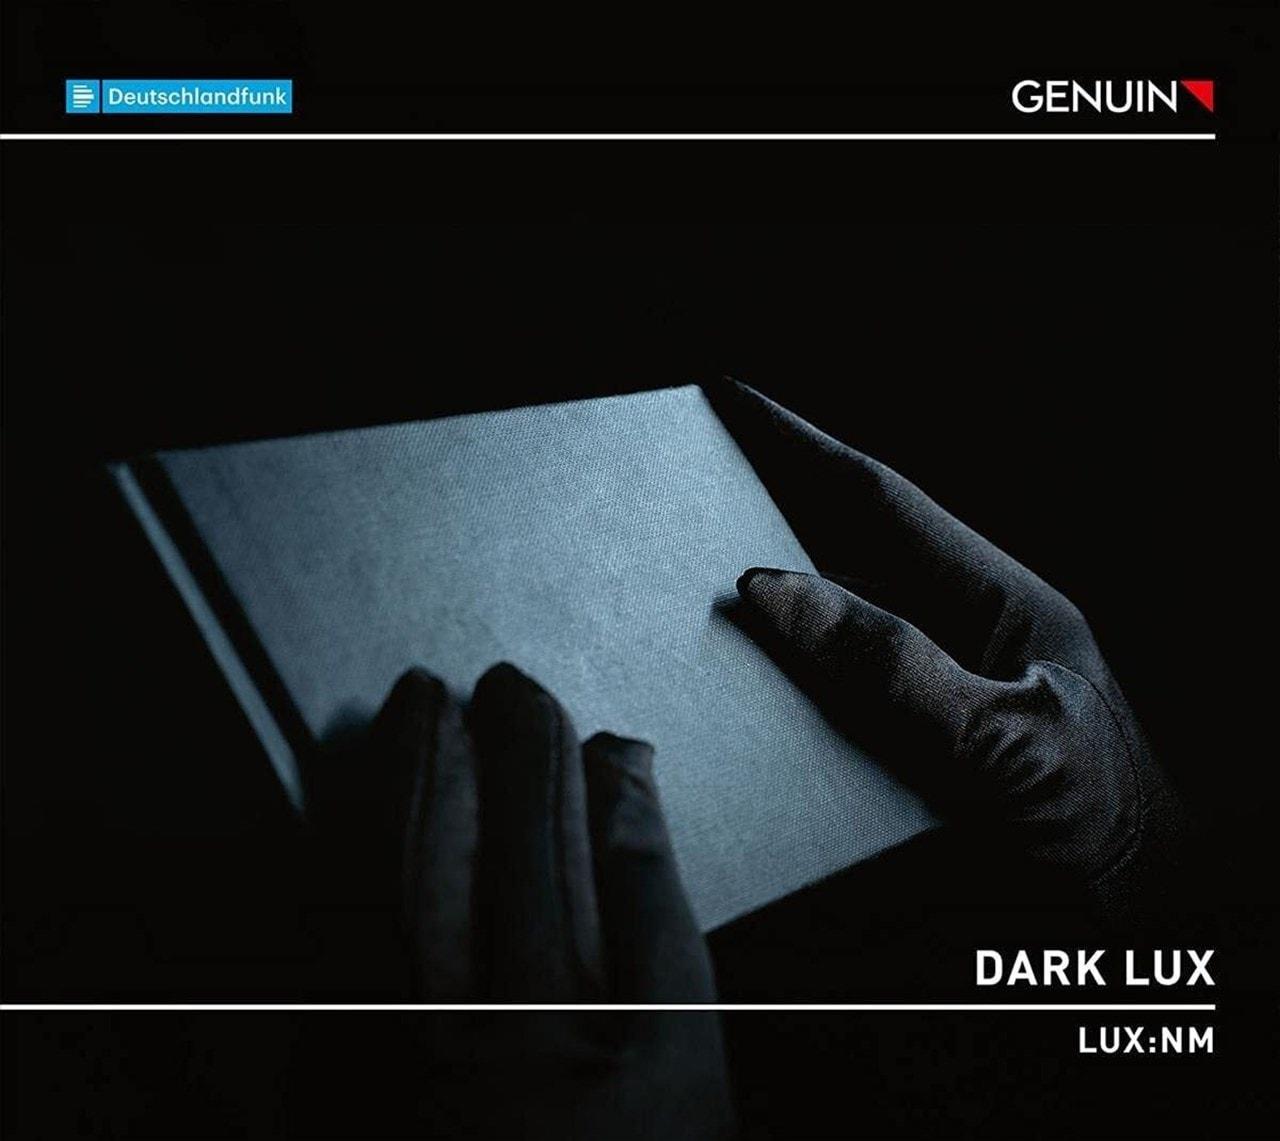 Ensemble LUX:NM: Dark Lux - 1